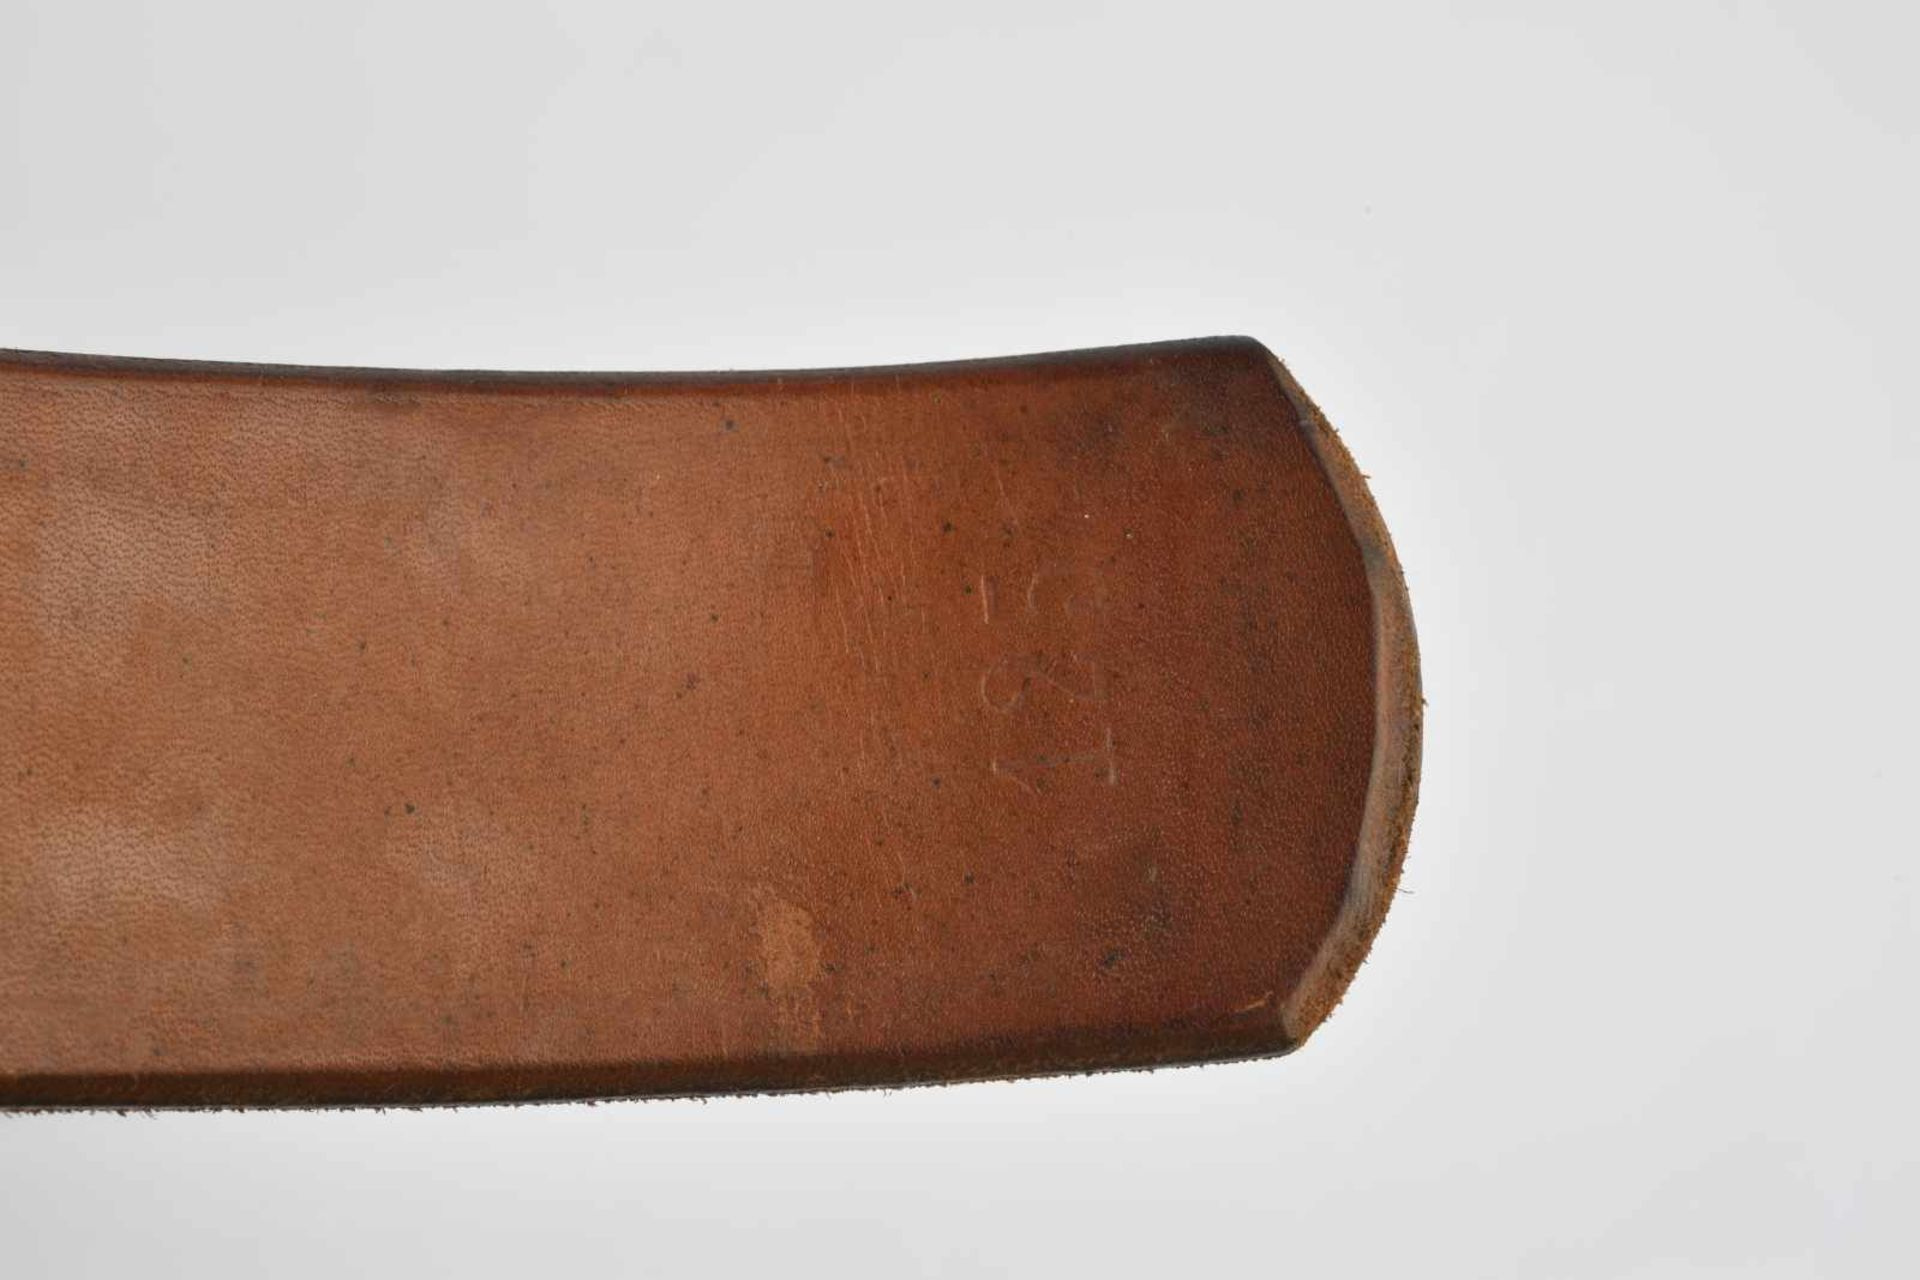 Ensemble de ceinturons en cuir comprenant un ceinturon en cuir sans marquage ni indication de - Bild 2 aus 3